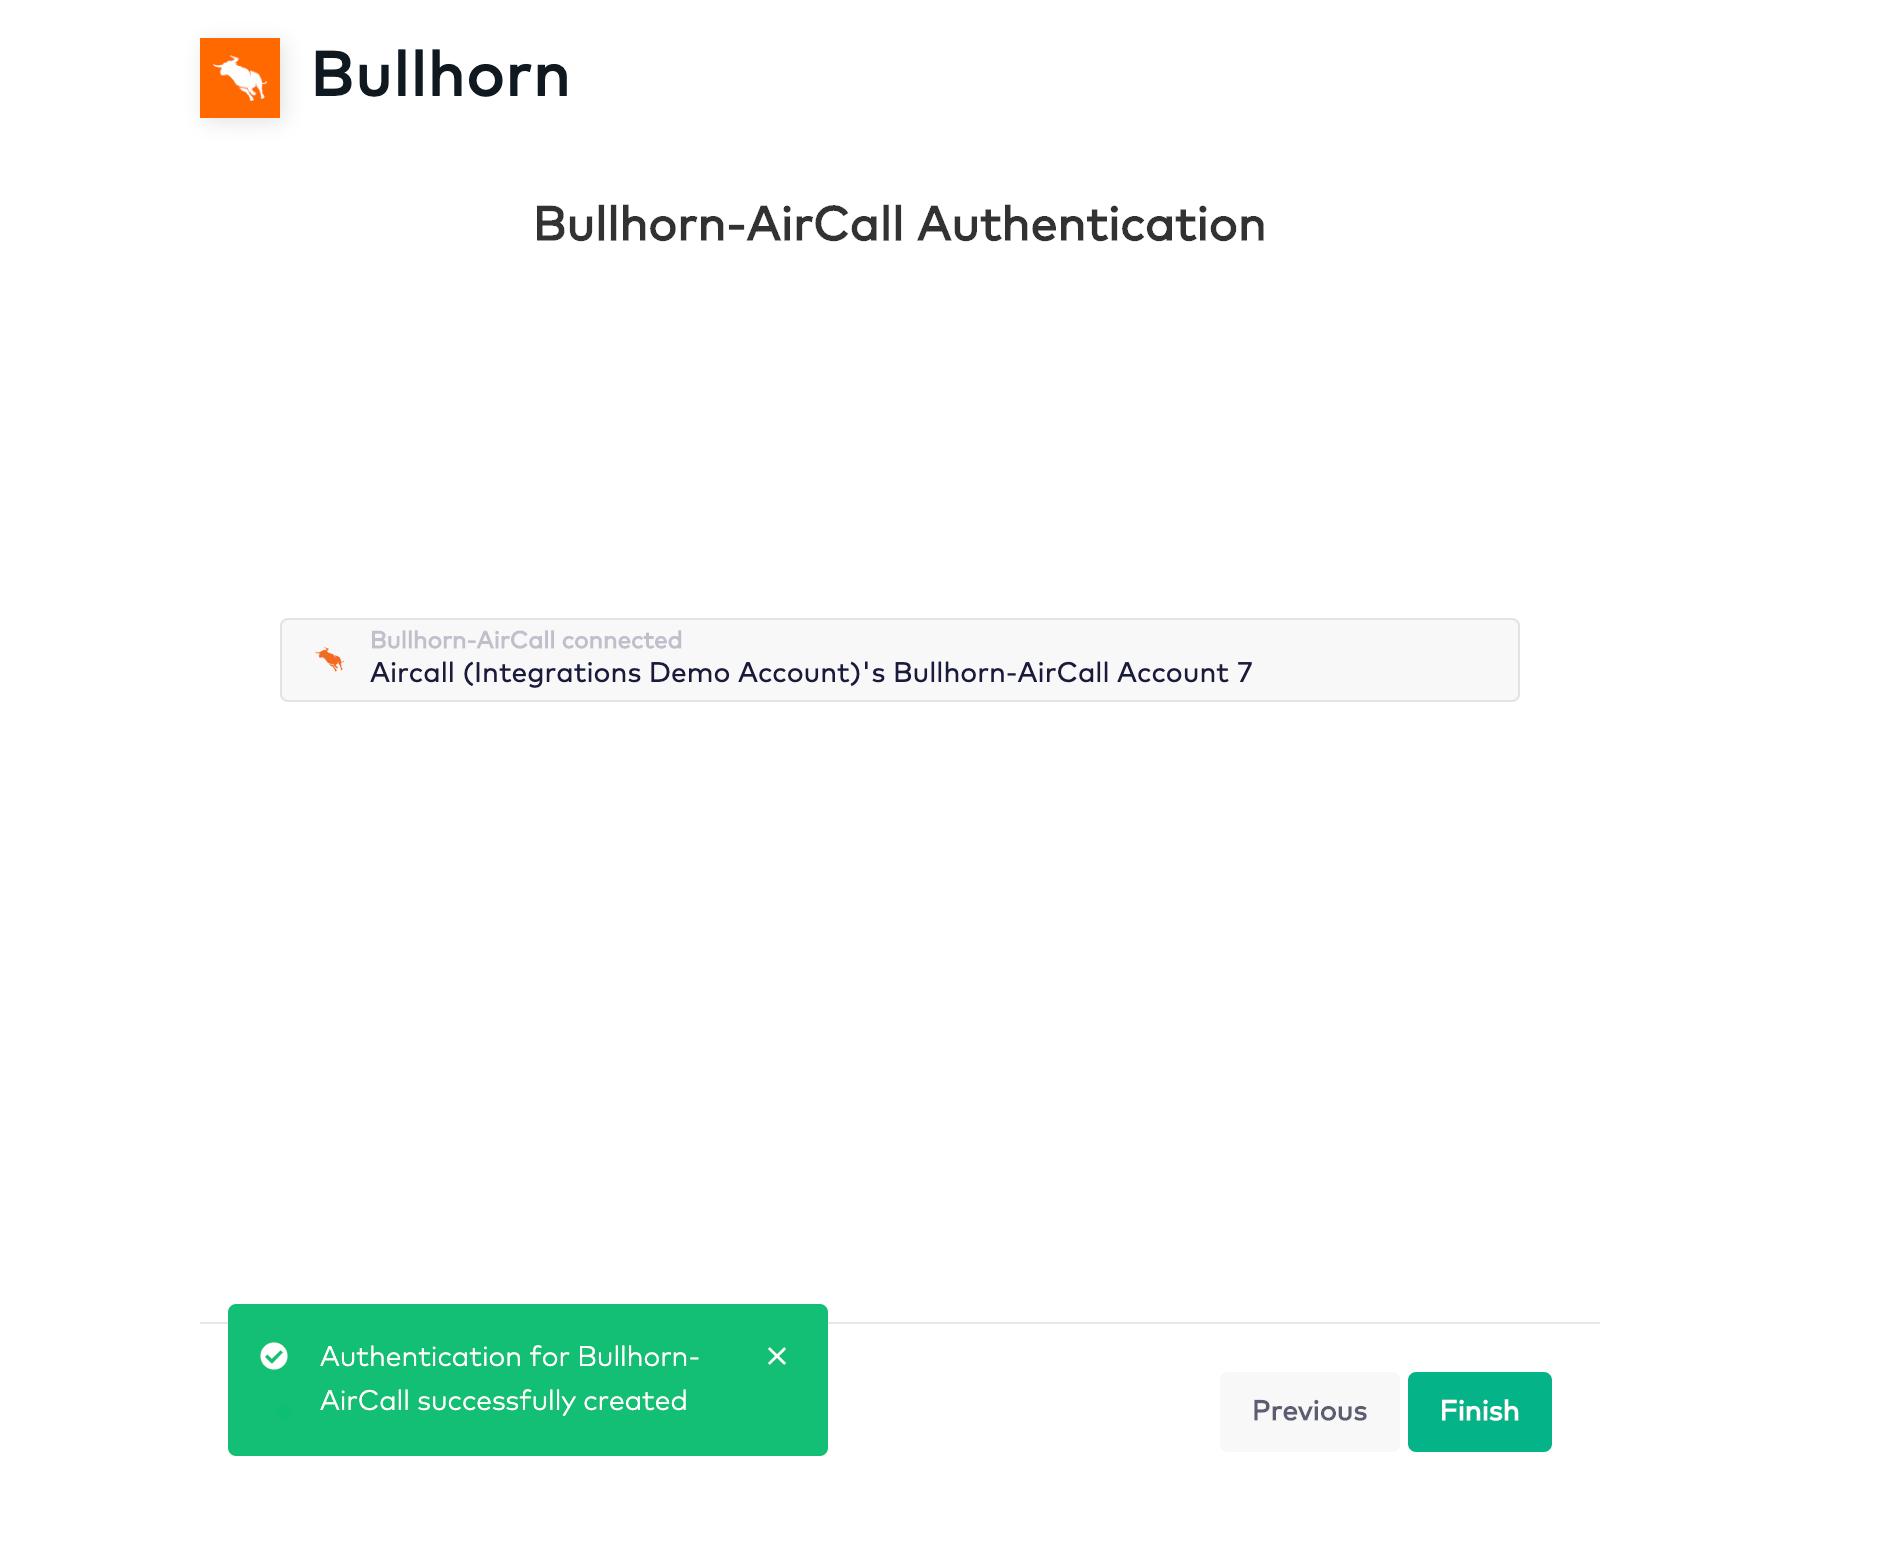 bullhorn_aircall_finalauthentication.png